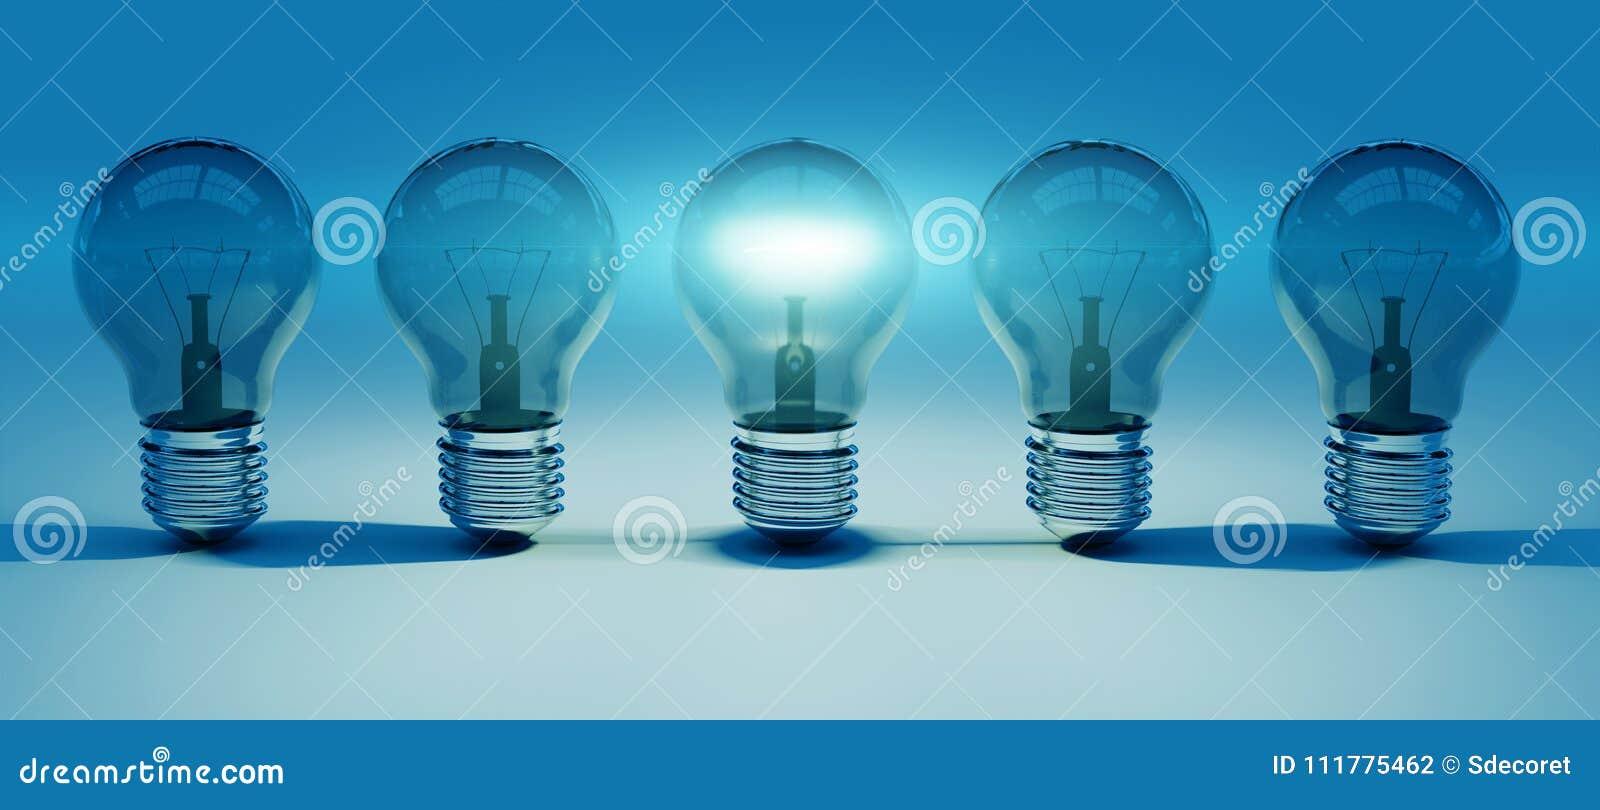 Bright lightbulbs lined up 3D rendering